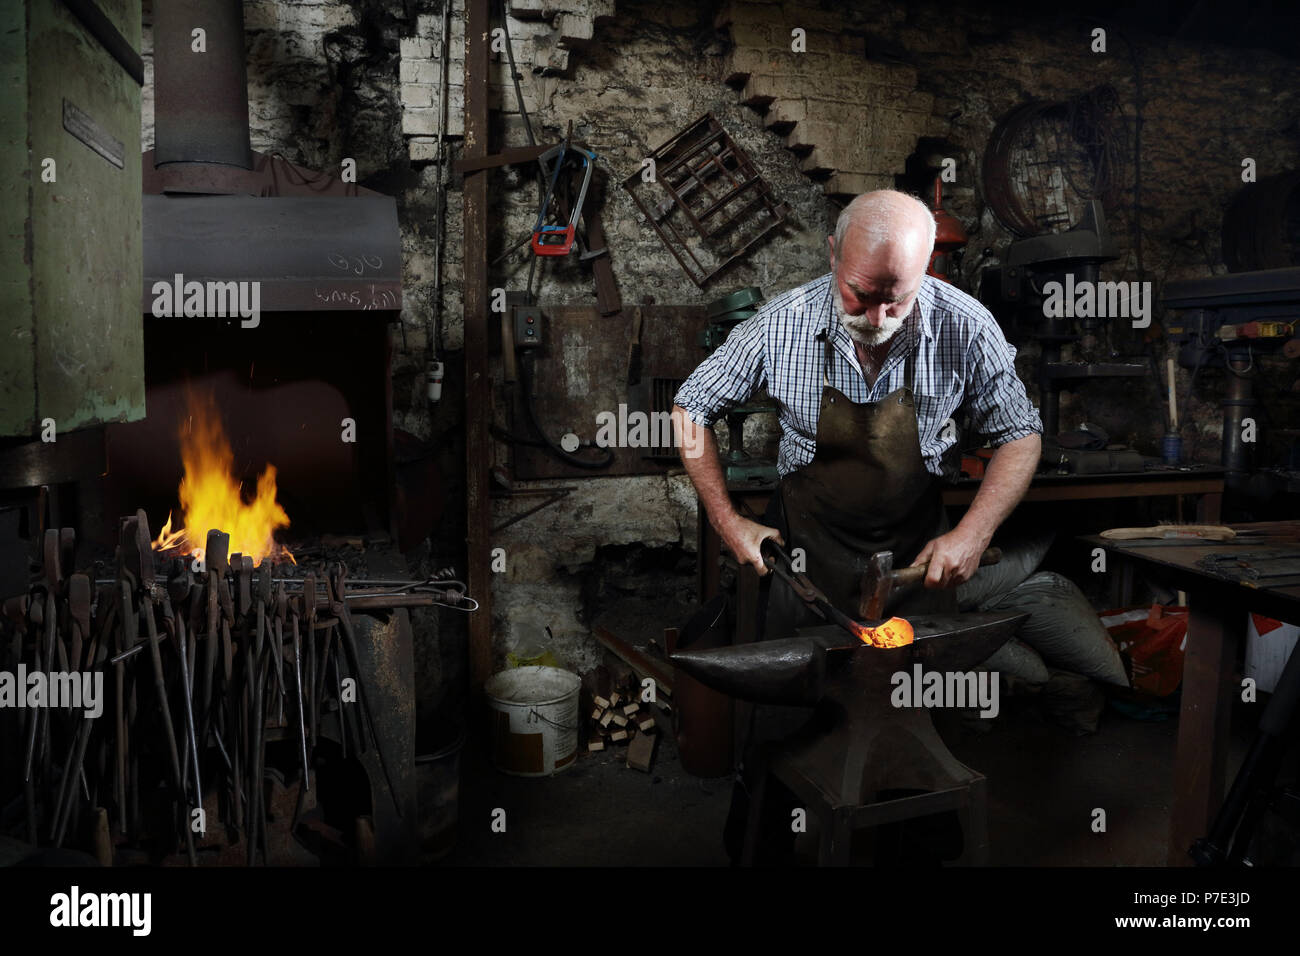 Blacksmith hammering red hot metal in blacksmiths shop - Stock Image